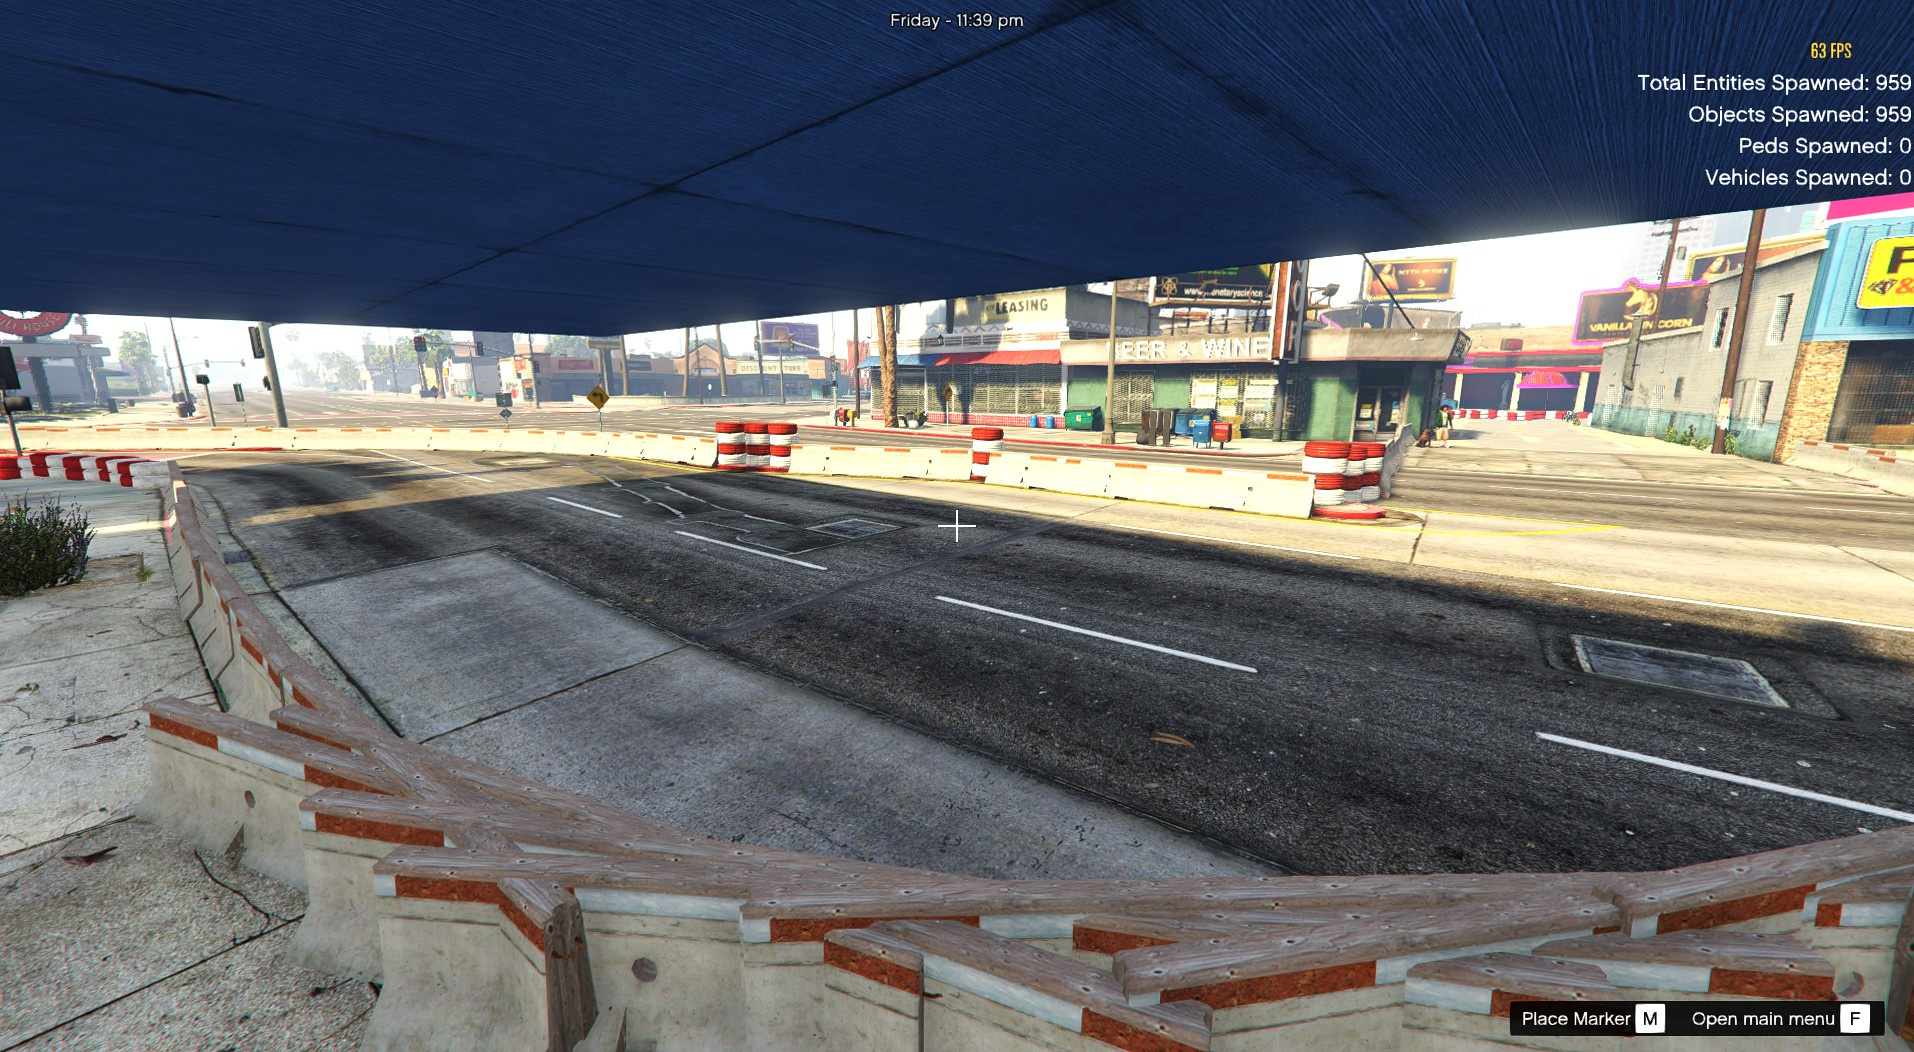 parking garage drift track or racetrack gta5 mods Precast Parking Garage 30b78f 20160805233902 1